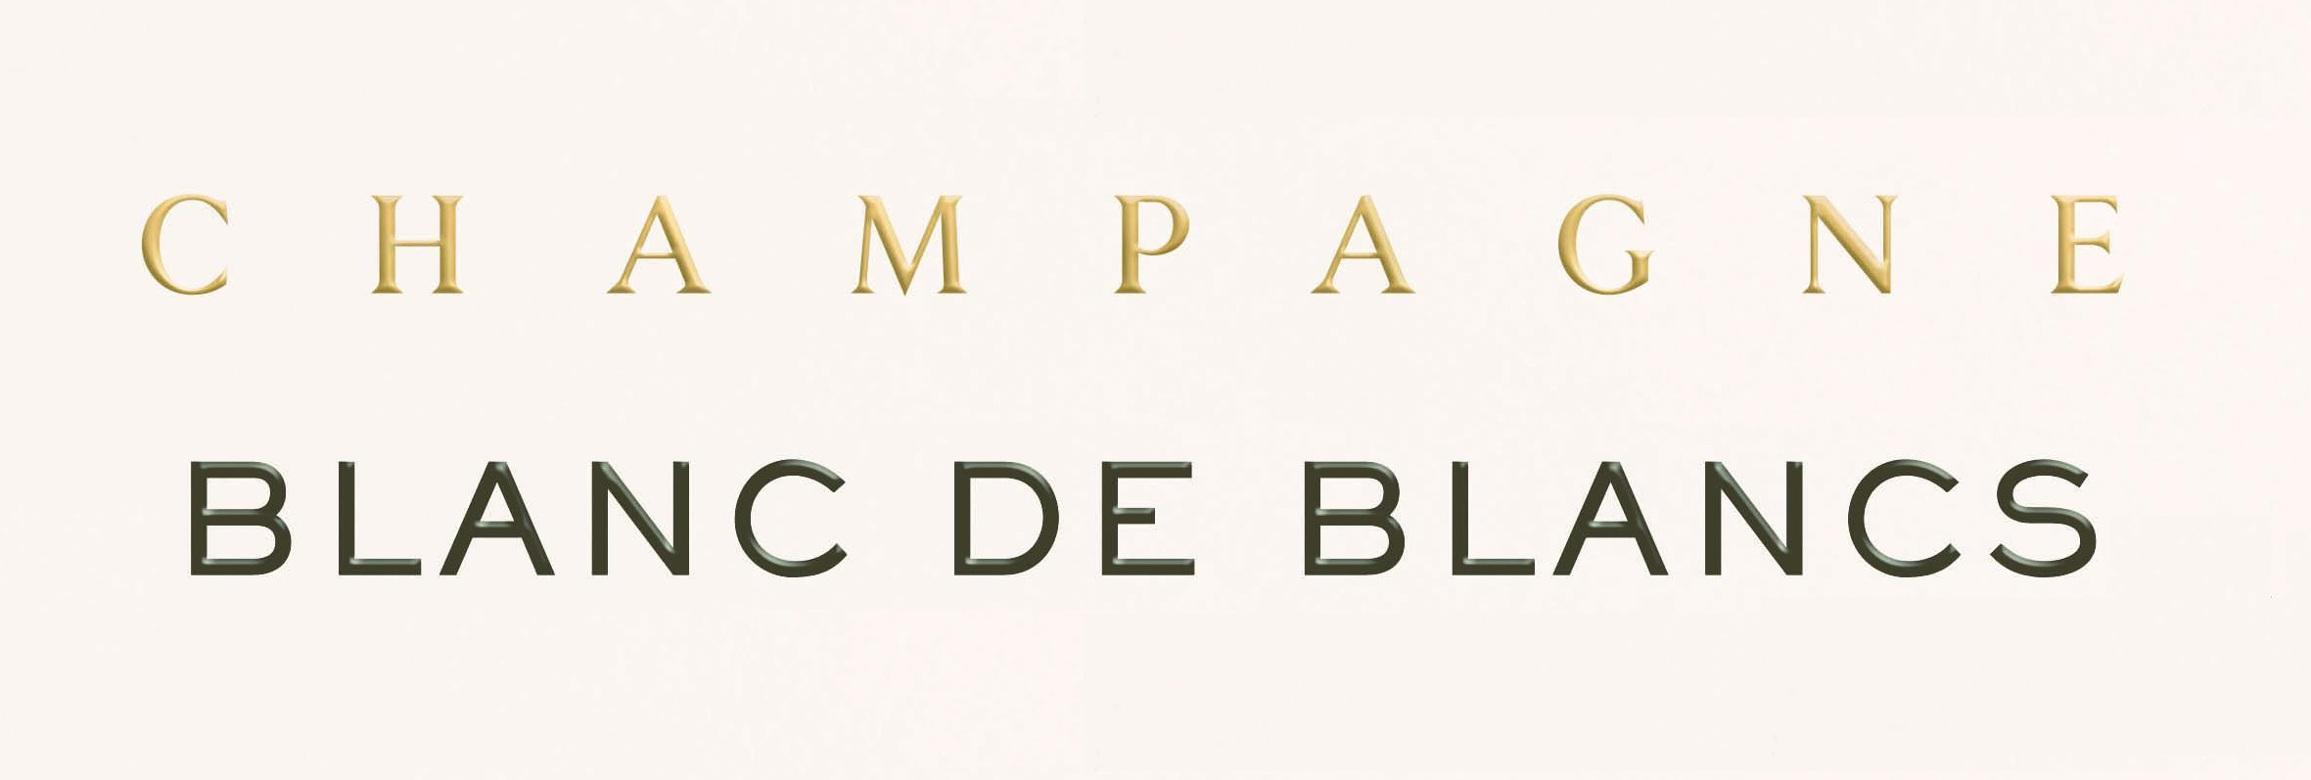 champagne-blanc-de-blancs-header